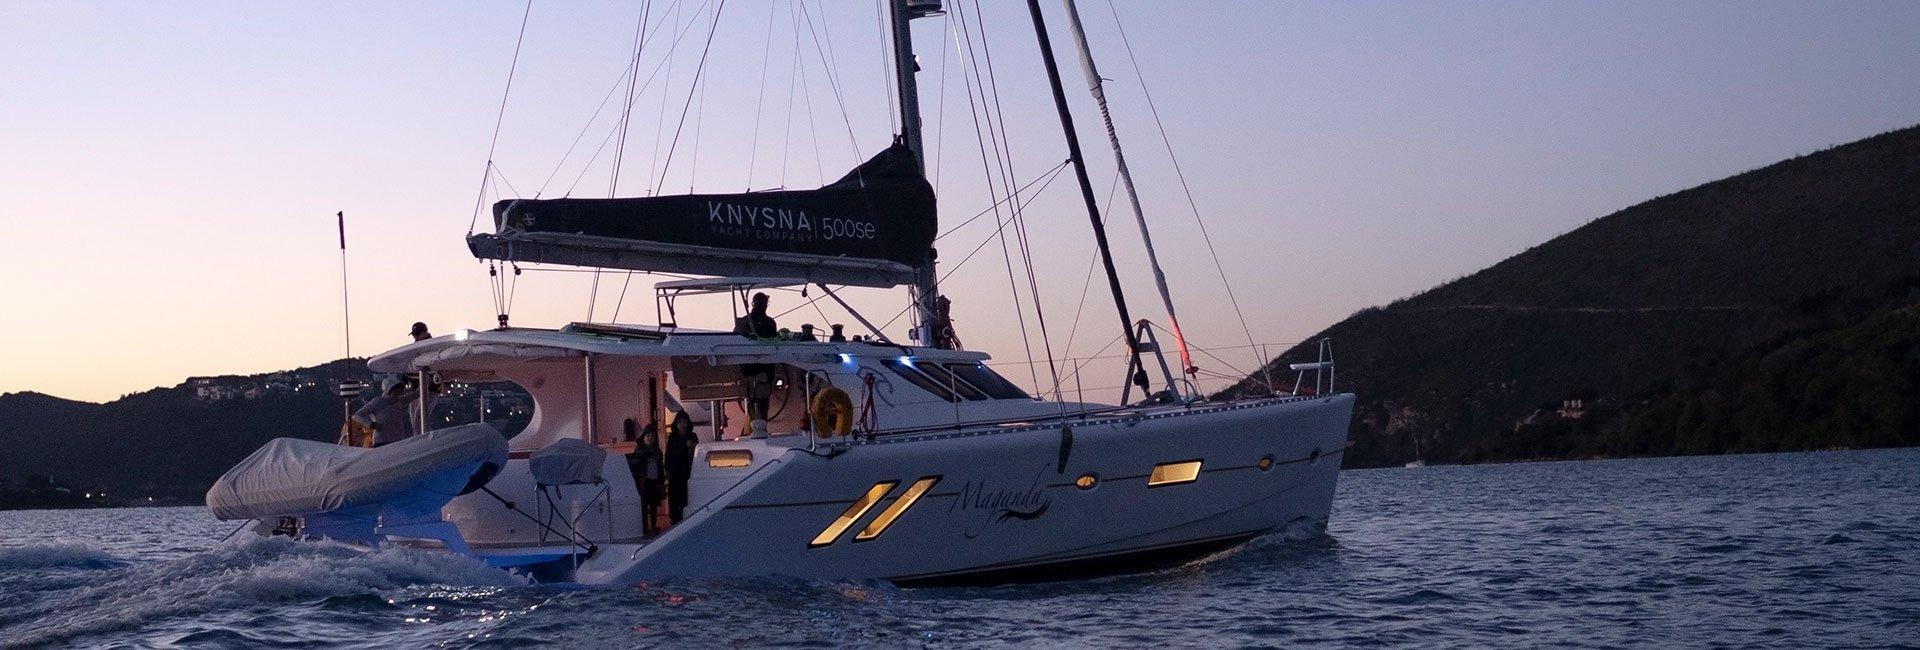 catamaran on water in sunset